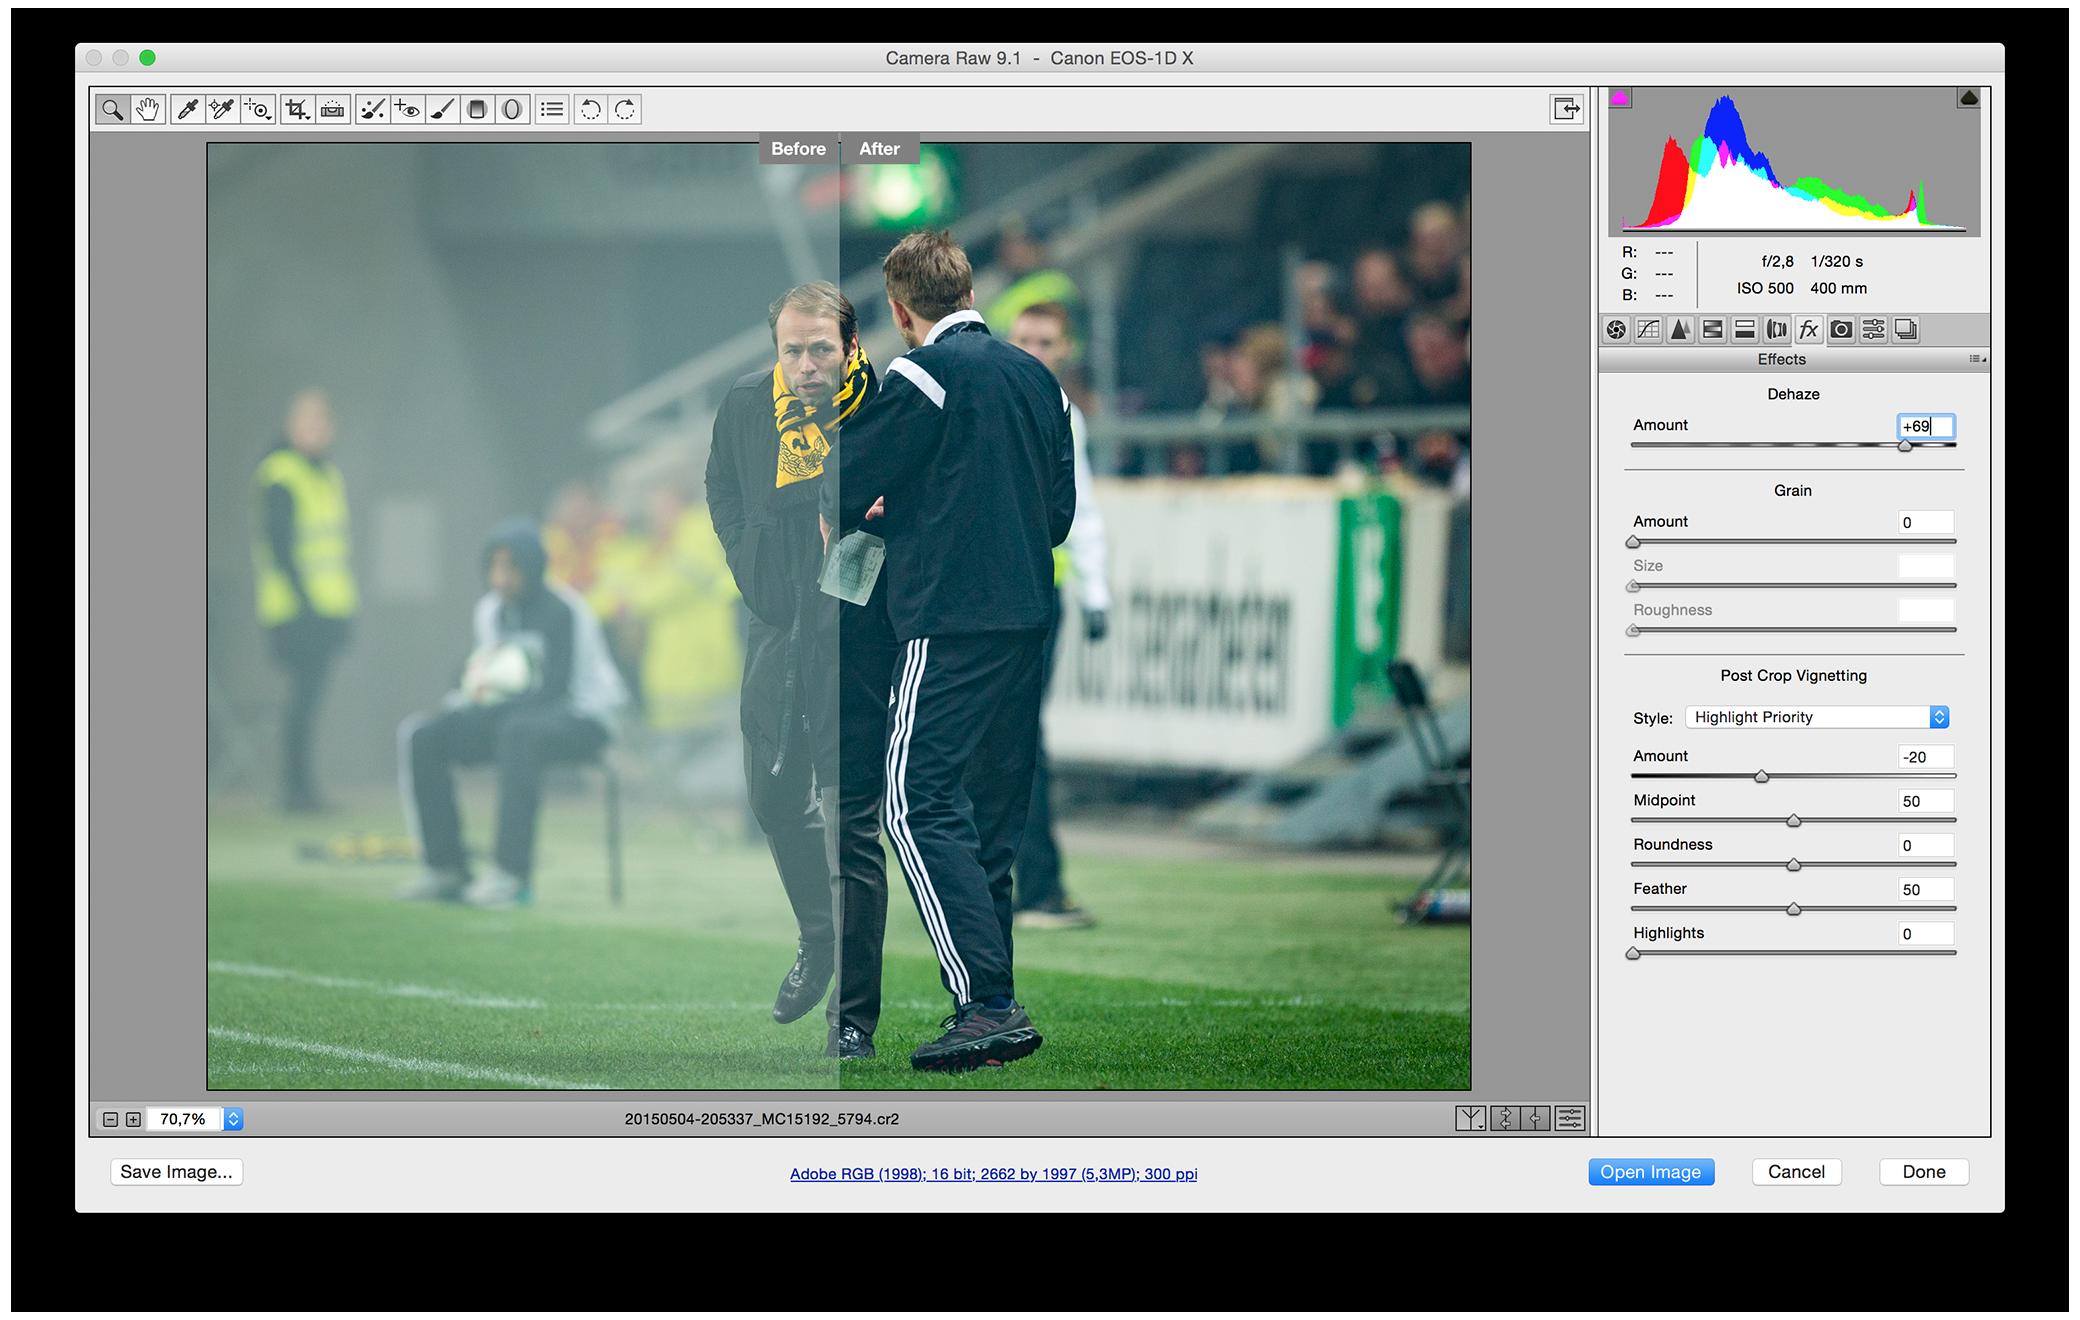 Dehaze tool in Photoshop CC 2015 - Michael Campanella Phtography